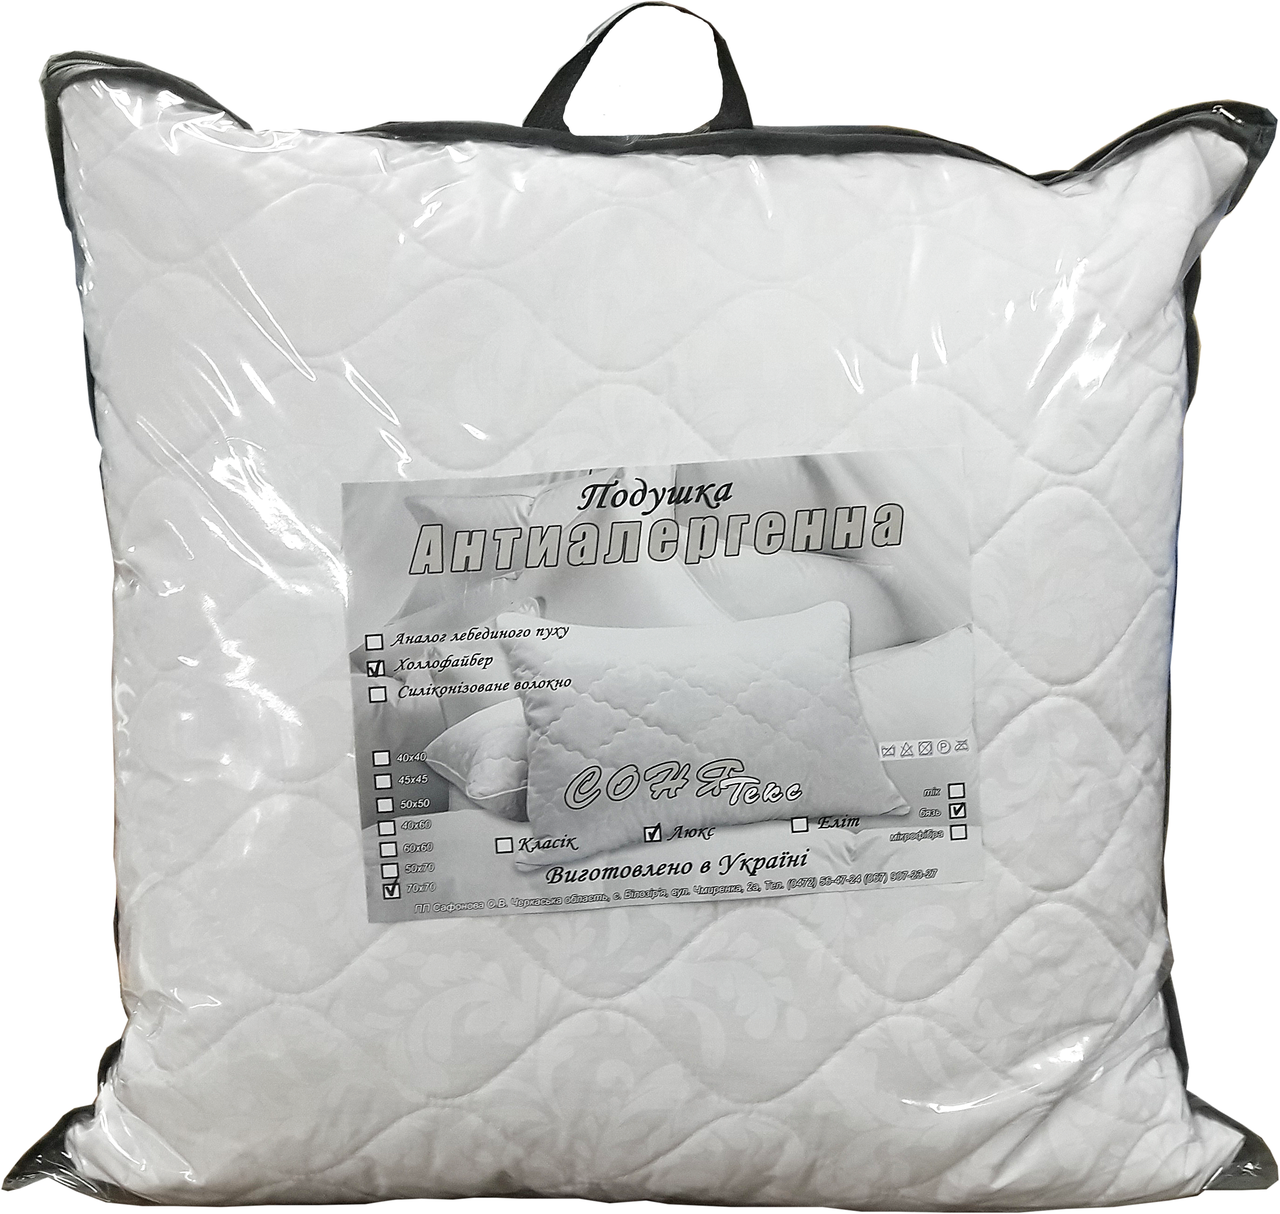 Подушка гипоаллергенная 70х70 с наволочкой на молнии (холлофайбер) - СОНЯ ТЕКС